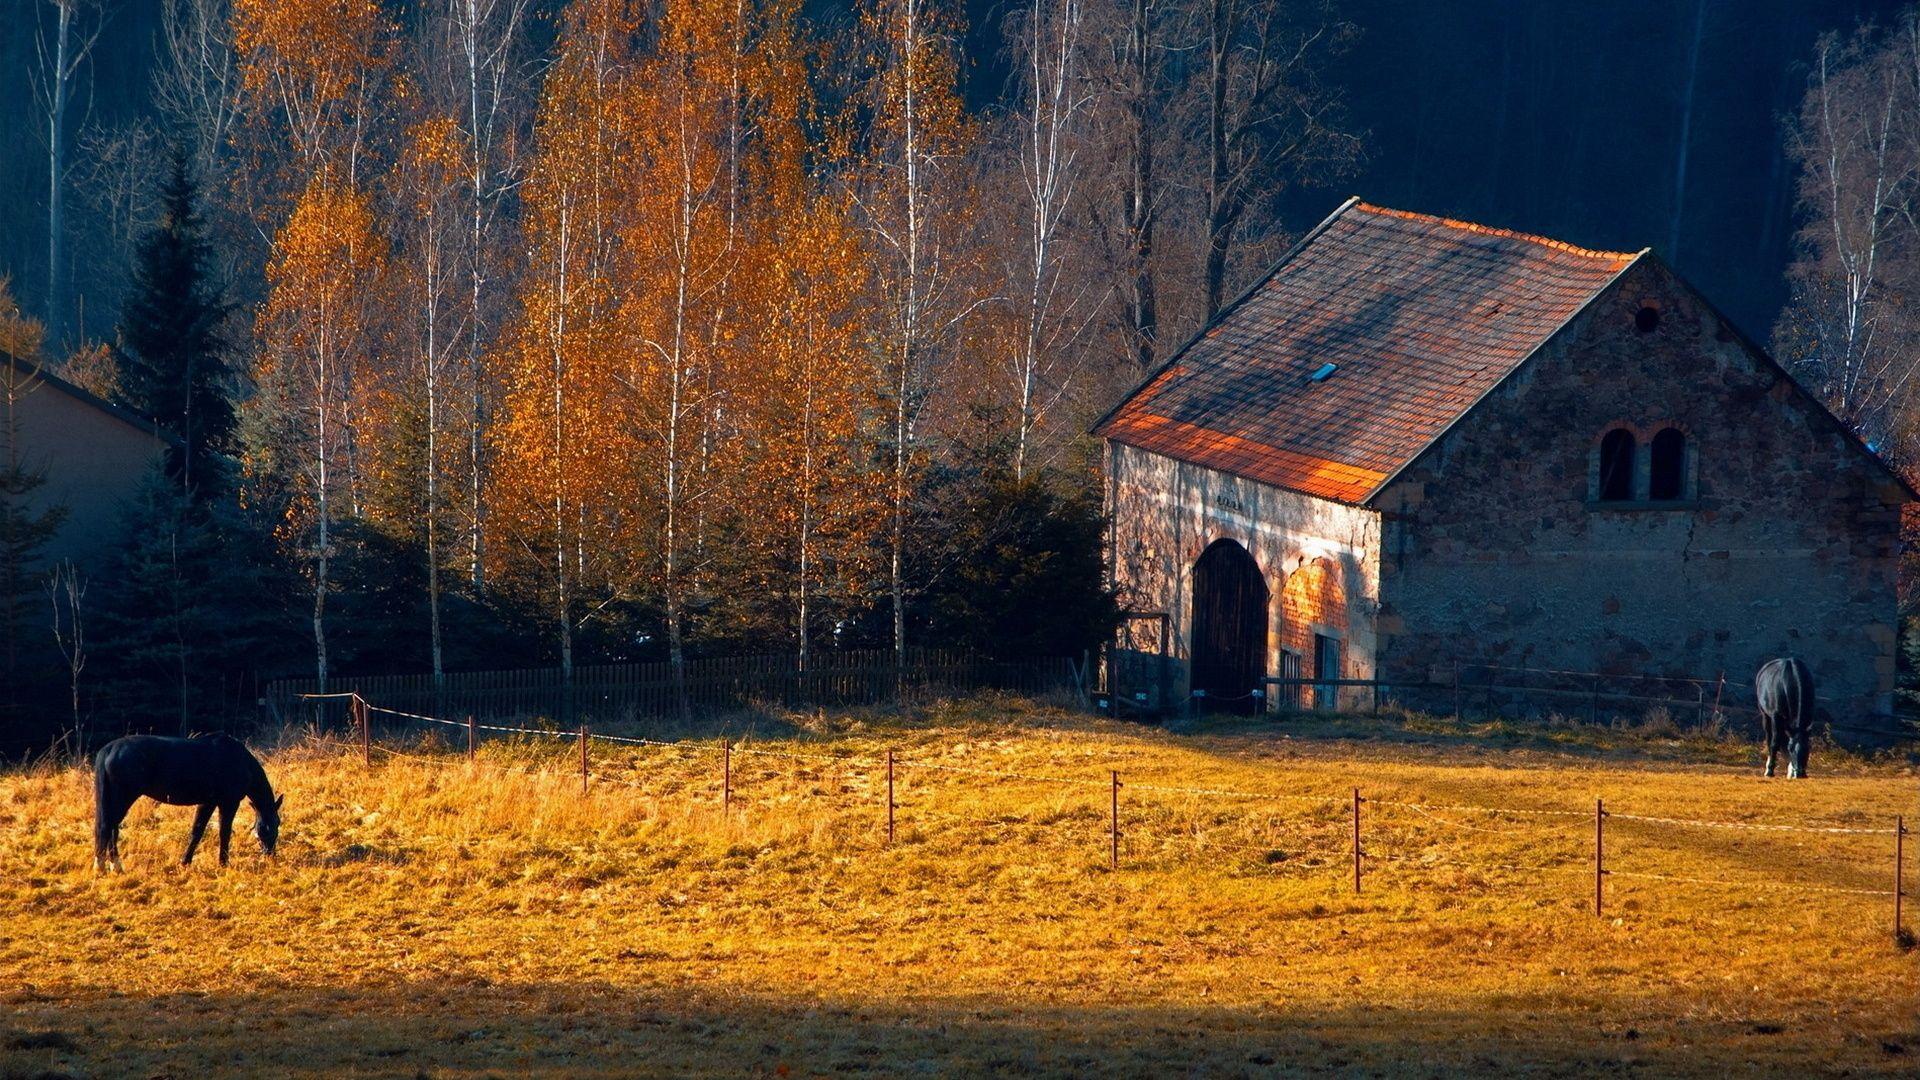 Horses rustic farm barn landscapes buildings autumn fall